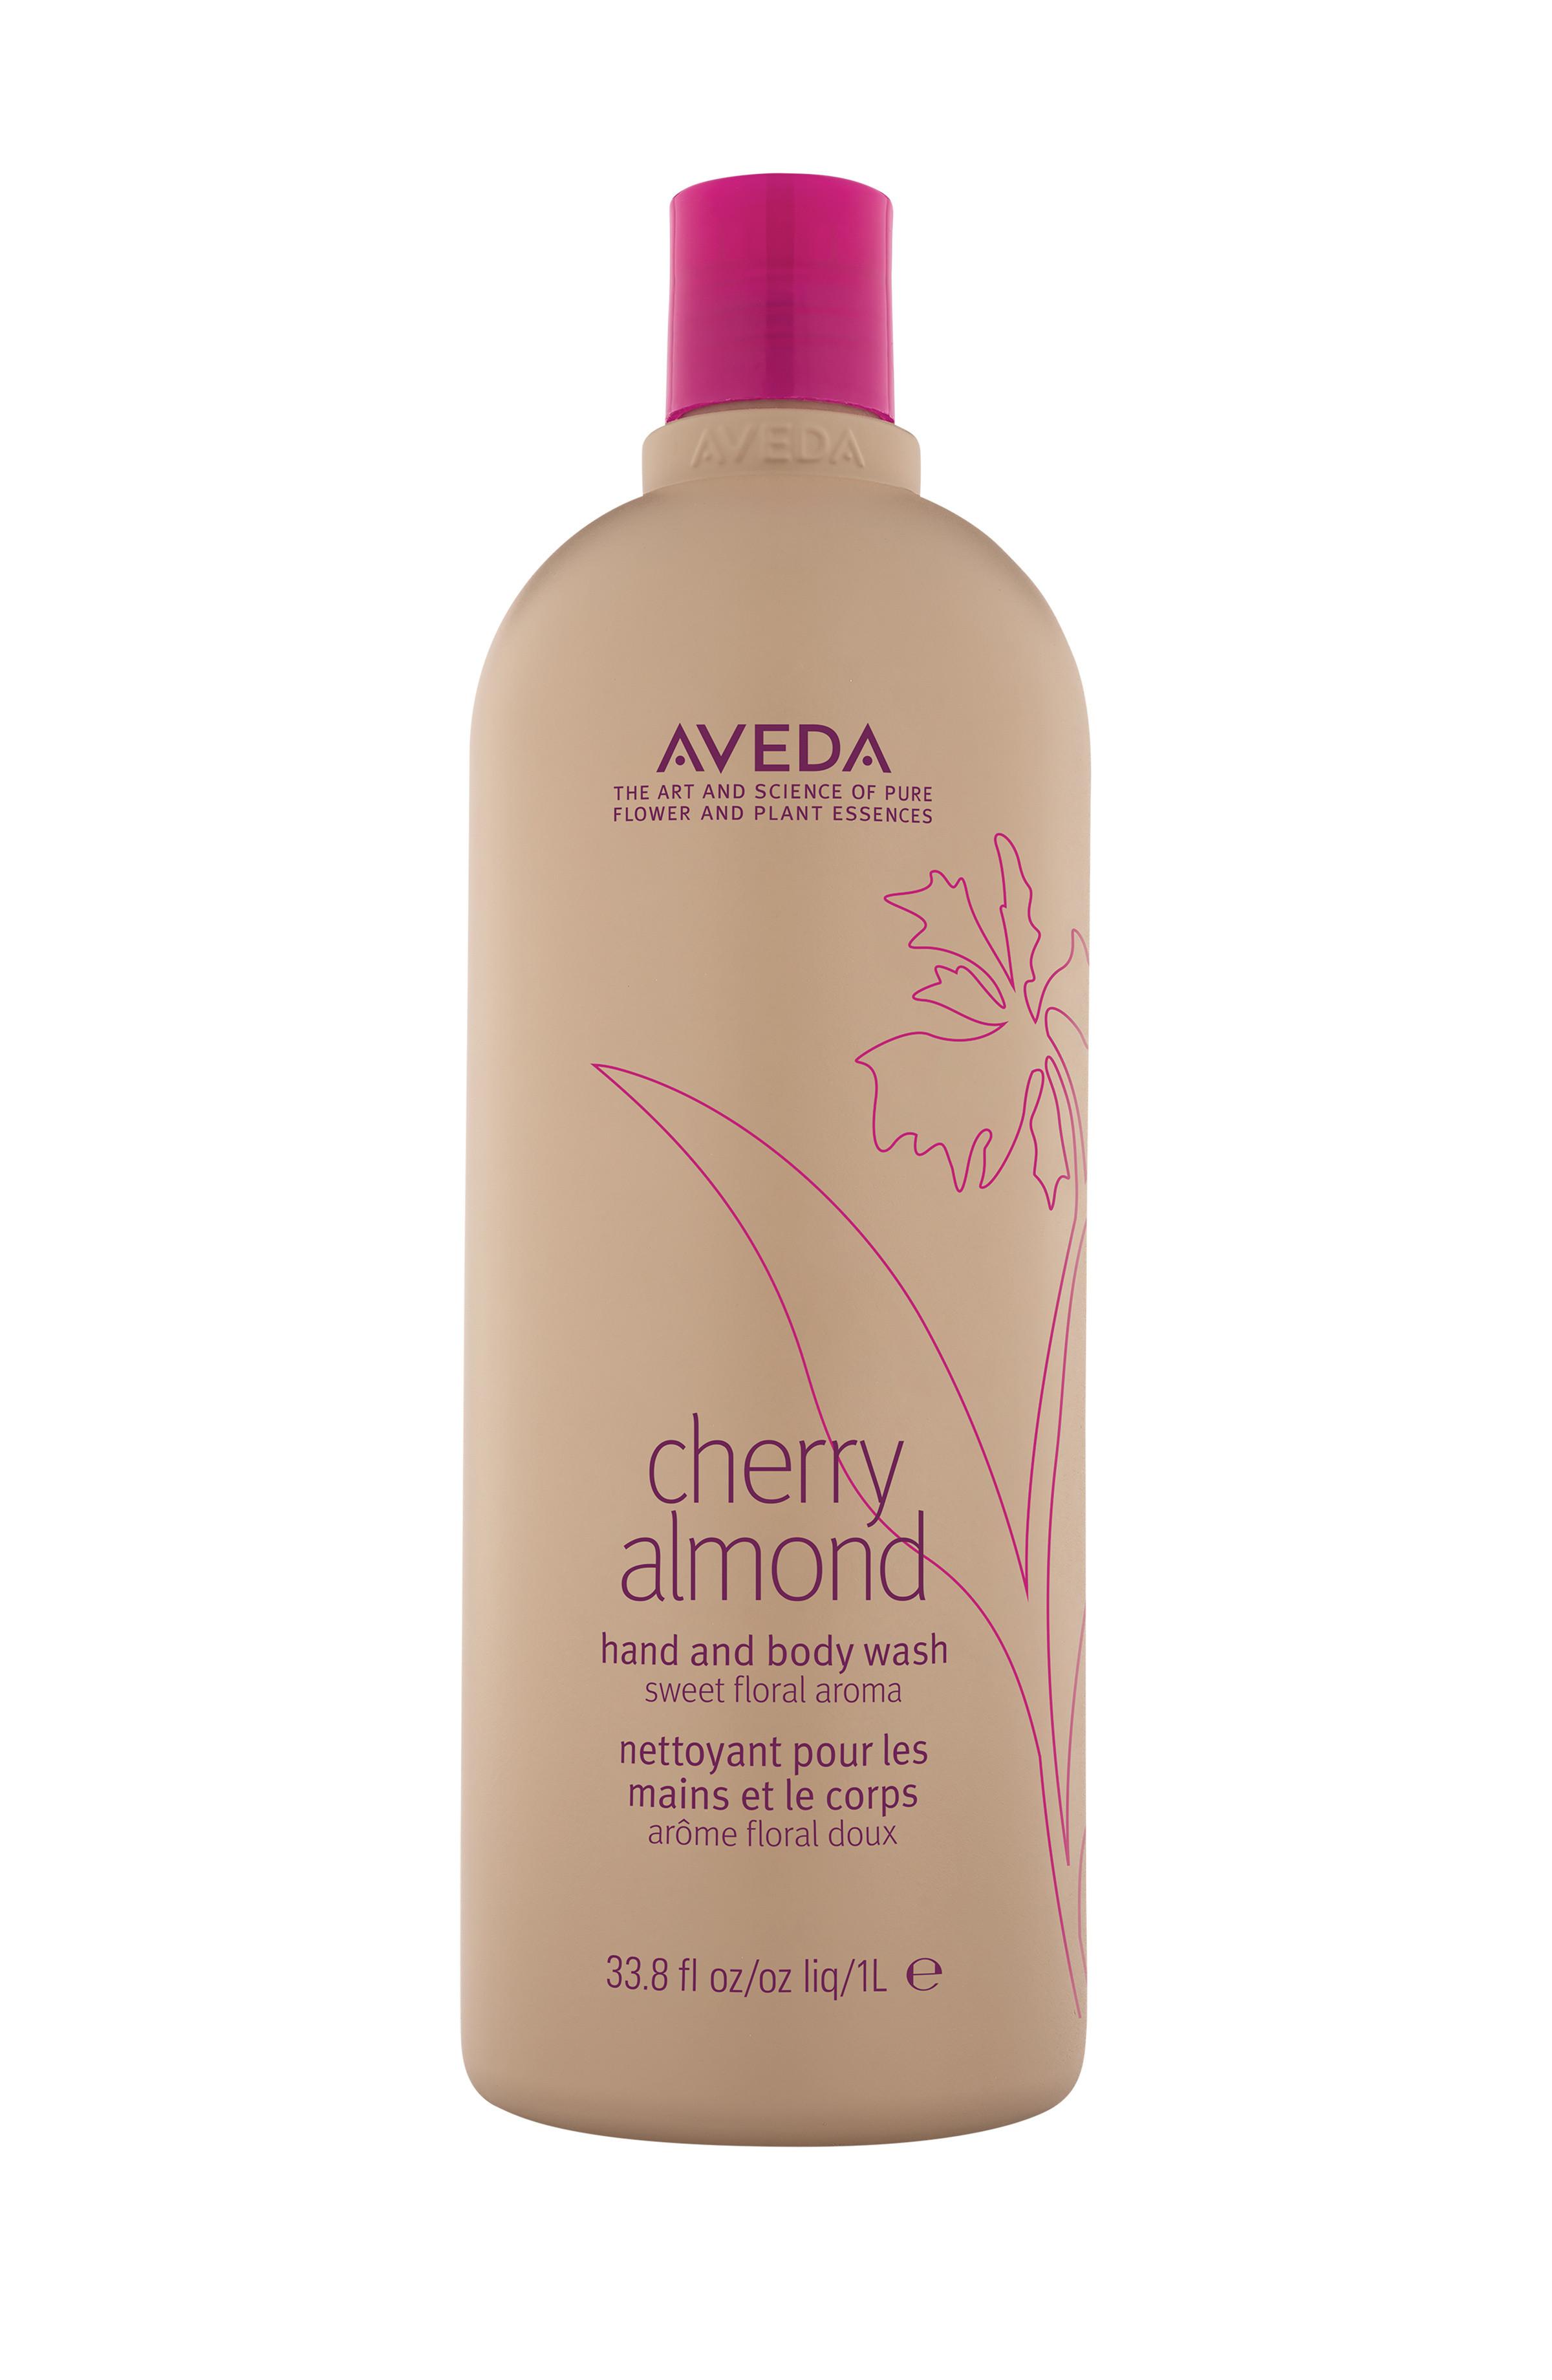 Aveda cherry almond docciaschiuma corpo e mani 1  lt, Beige, large image number 0